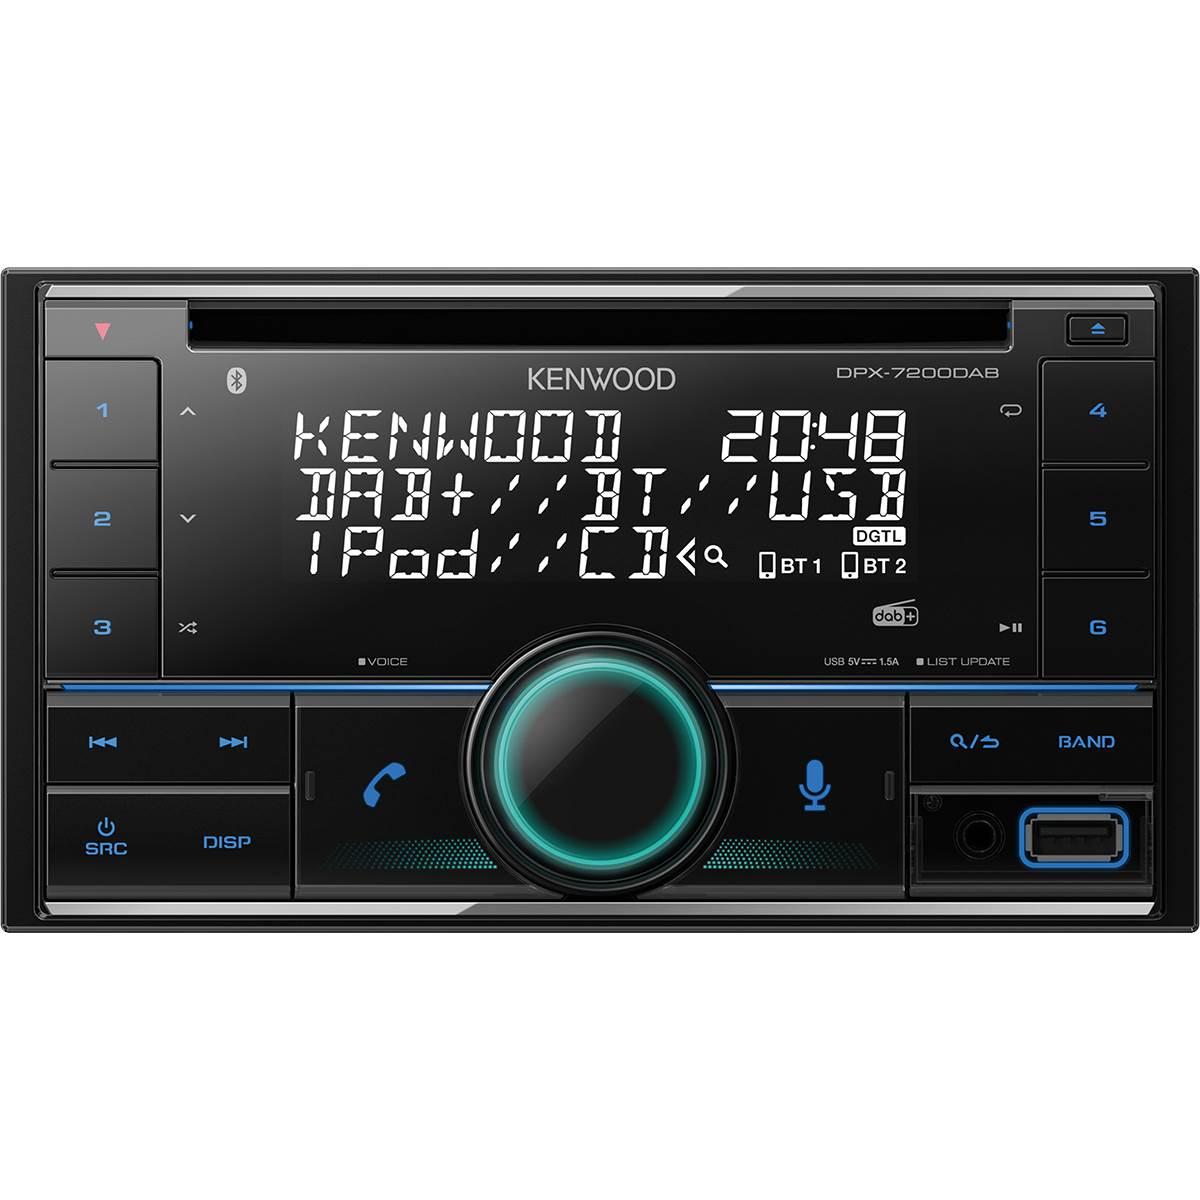 Autoradio DPX-7200DAB Kenwood